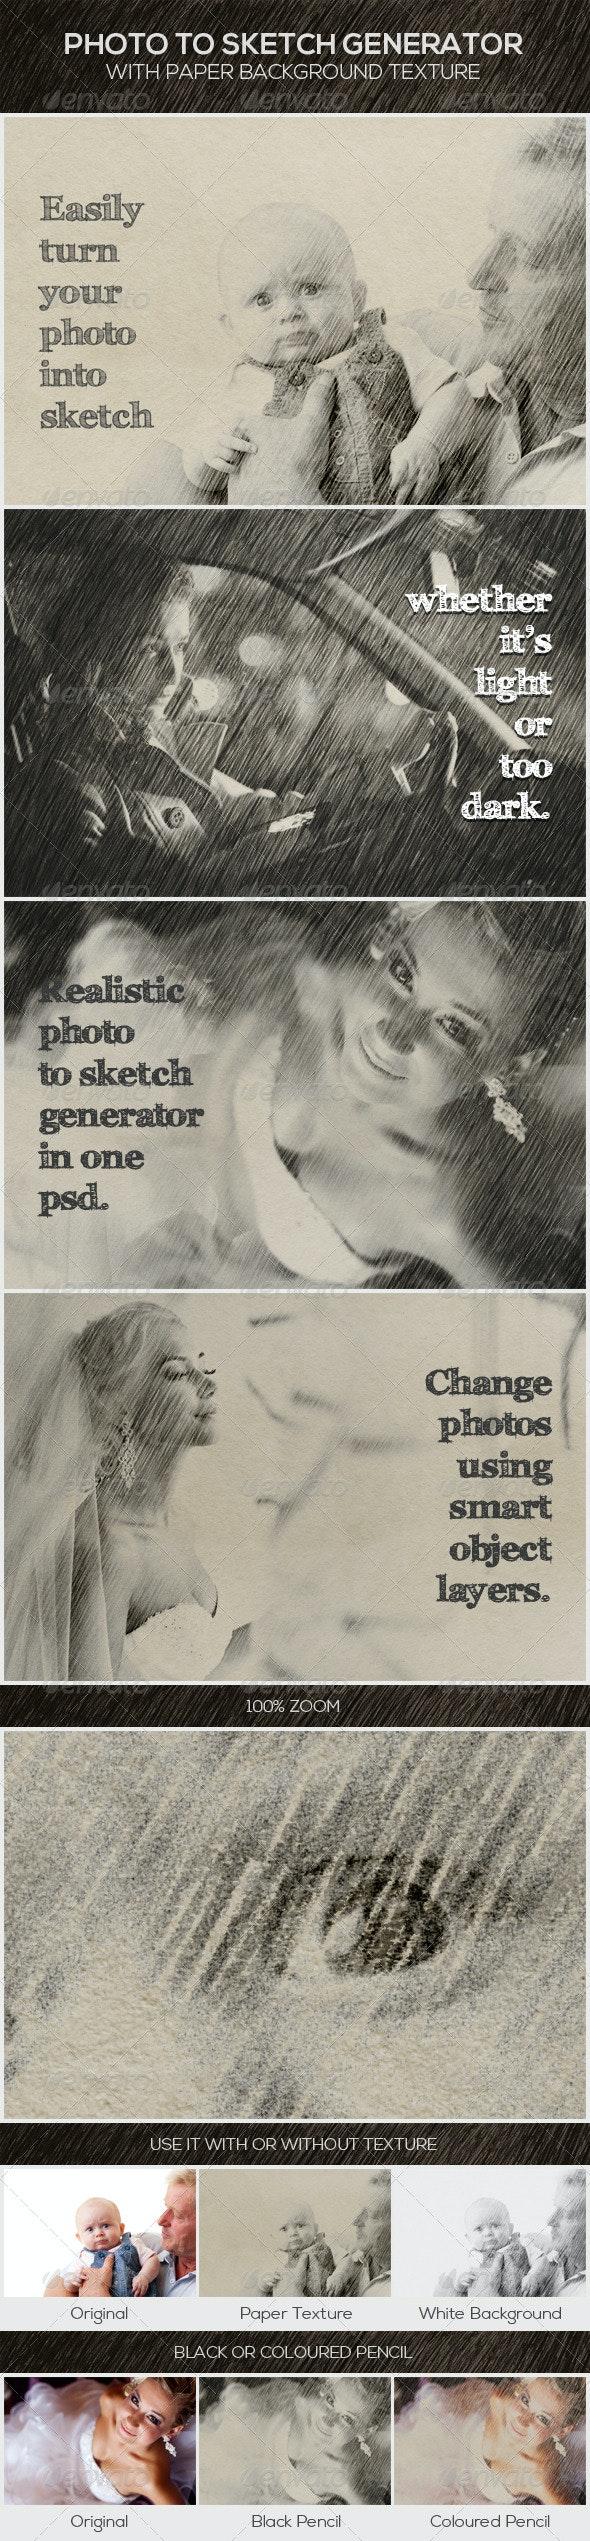 Photo to Sketch Generator - Artistic Photo Templates